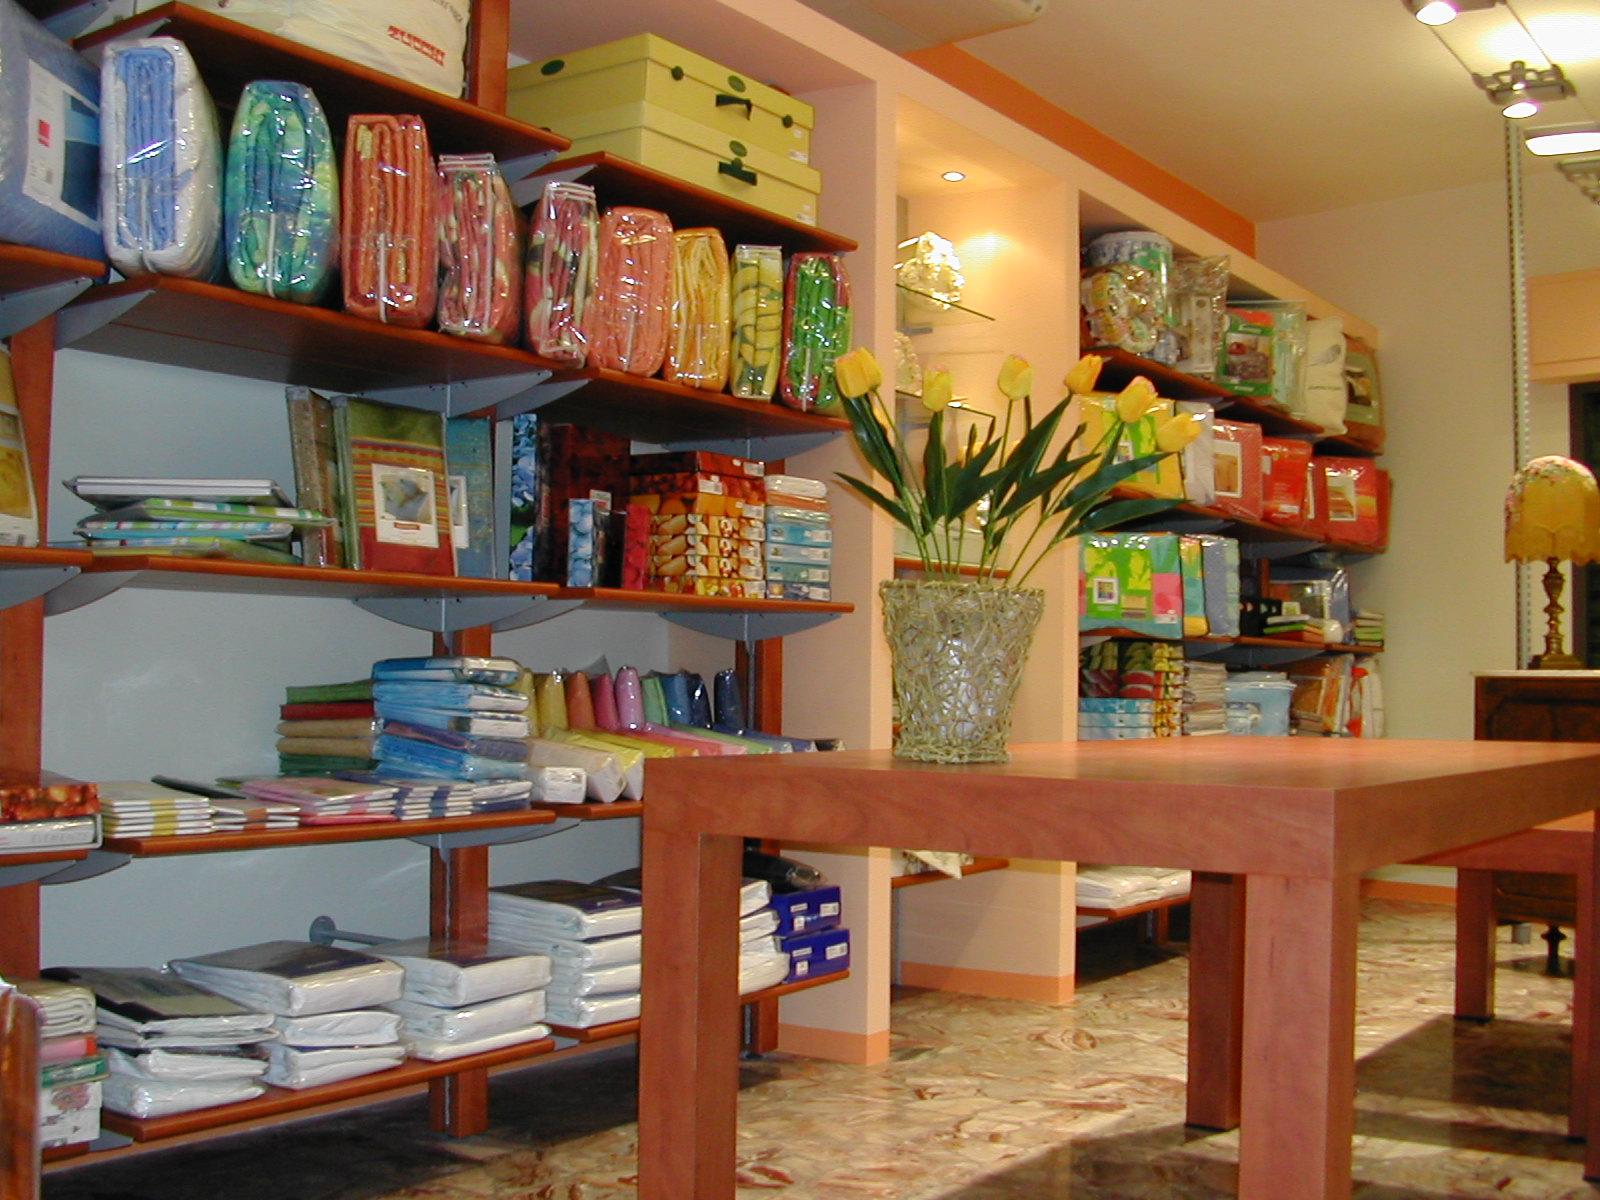 Arredamento per negozi di biancheria toscana belardi for Arredamento negozi